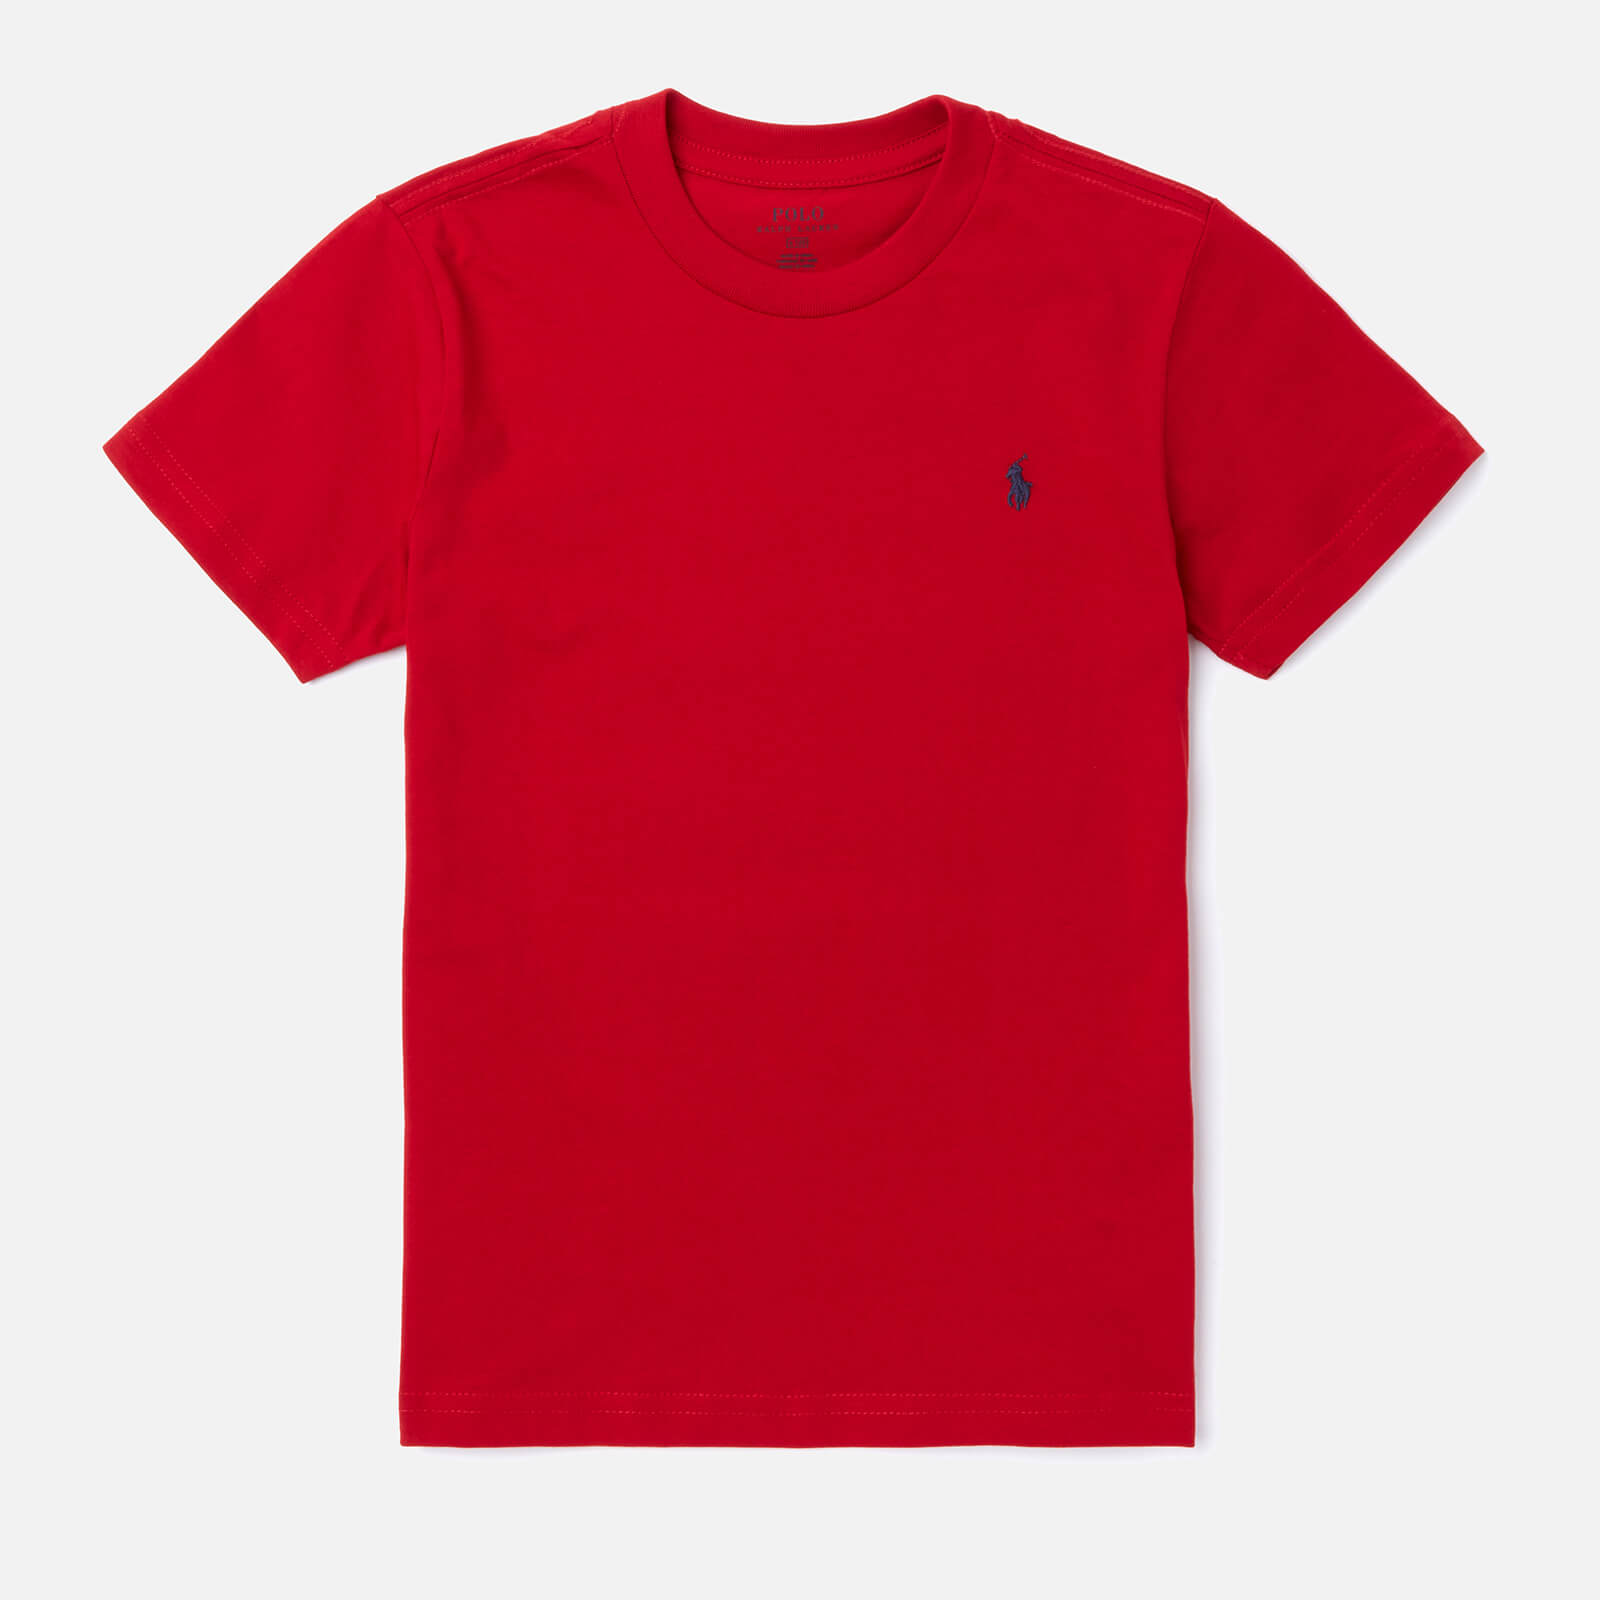 Polo Ralph Lauren Boys' Crew Neck T-Shirt - Red - 6 Years